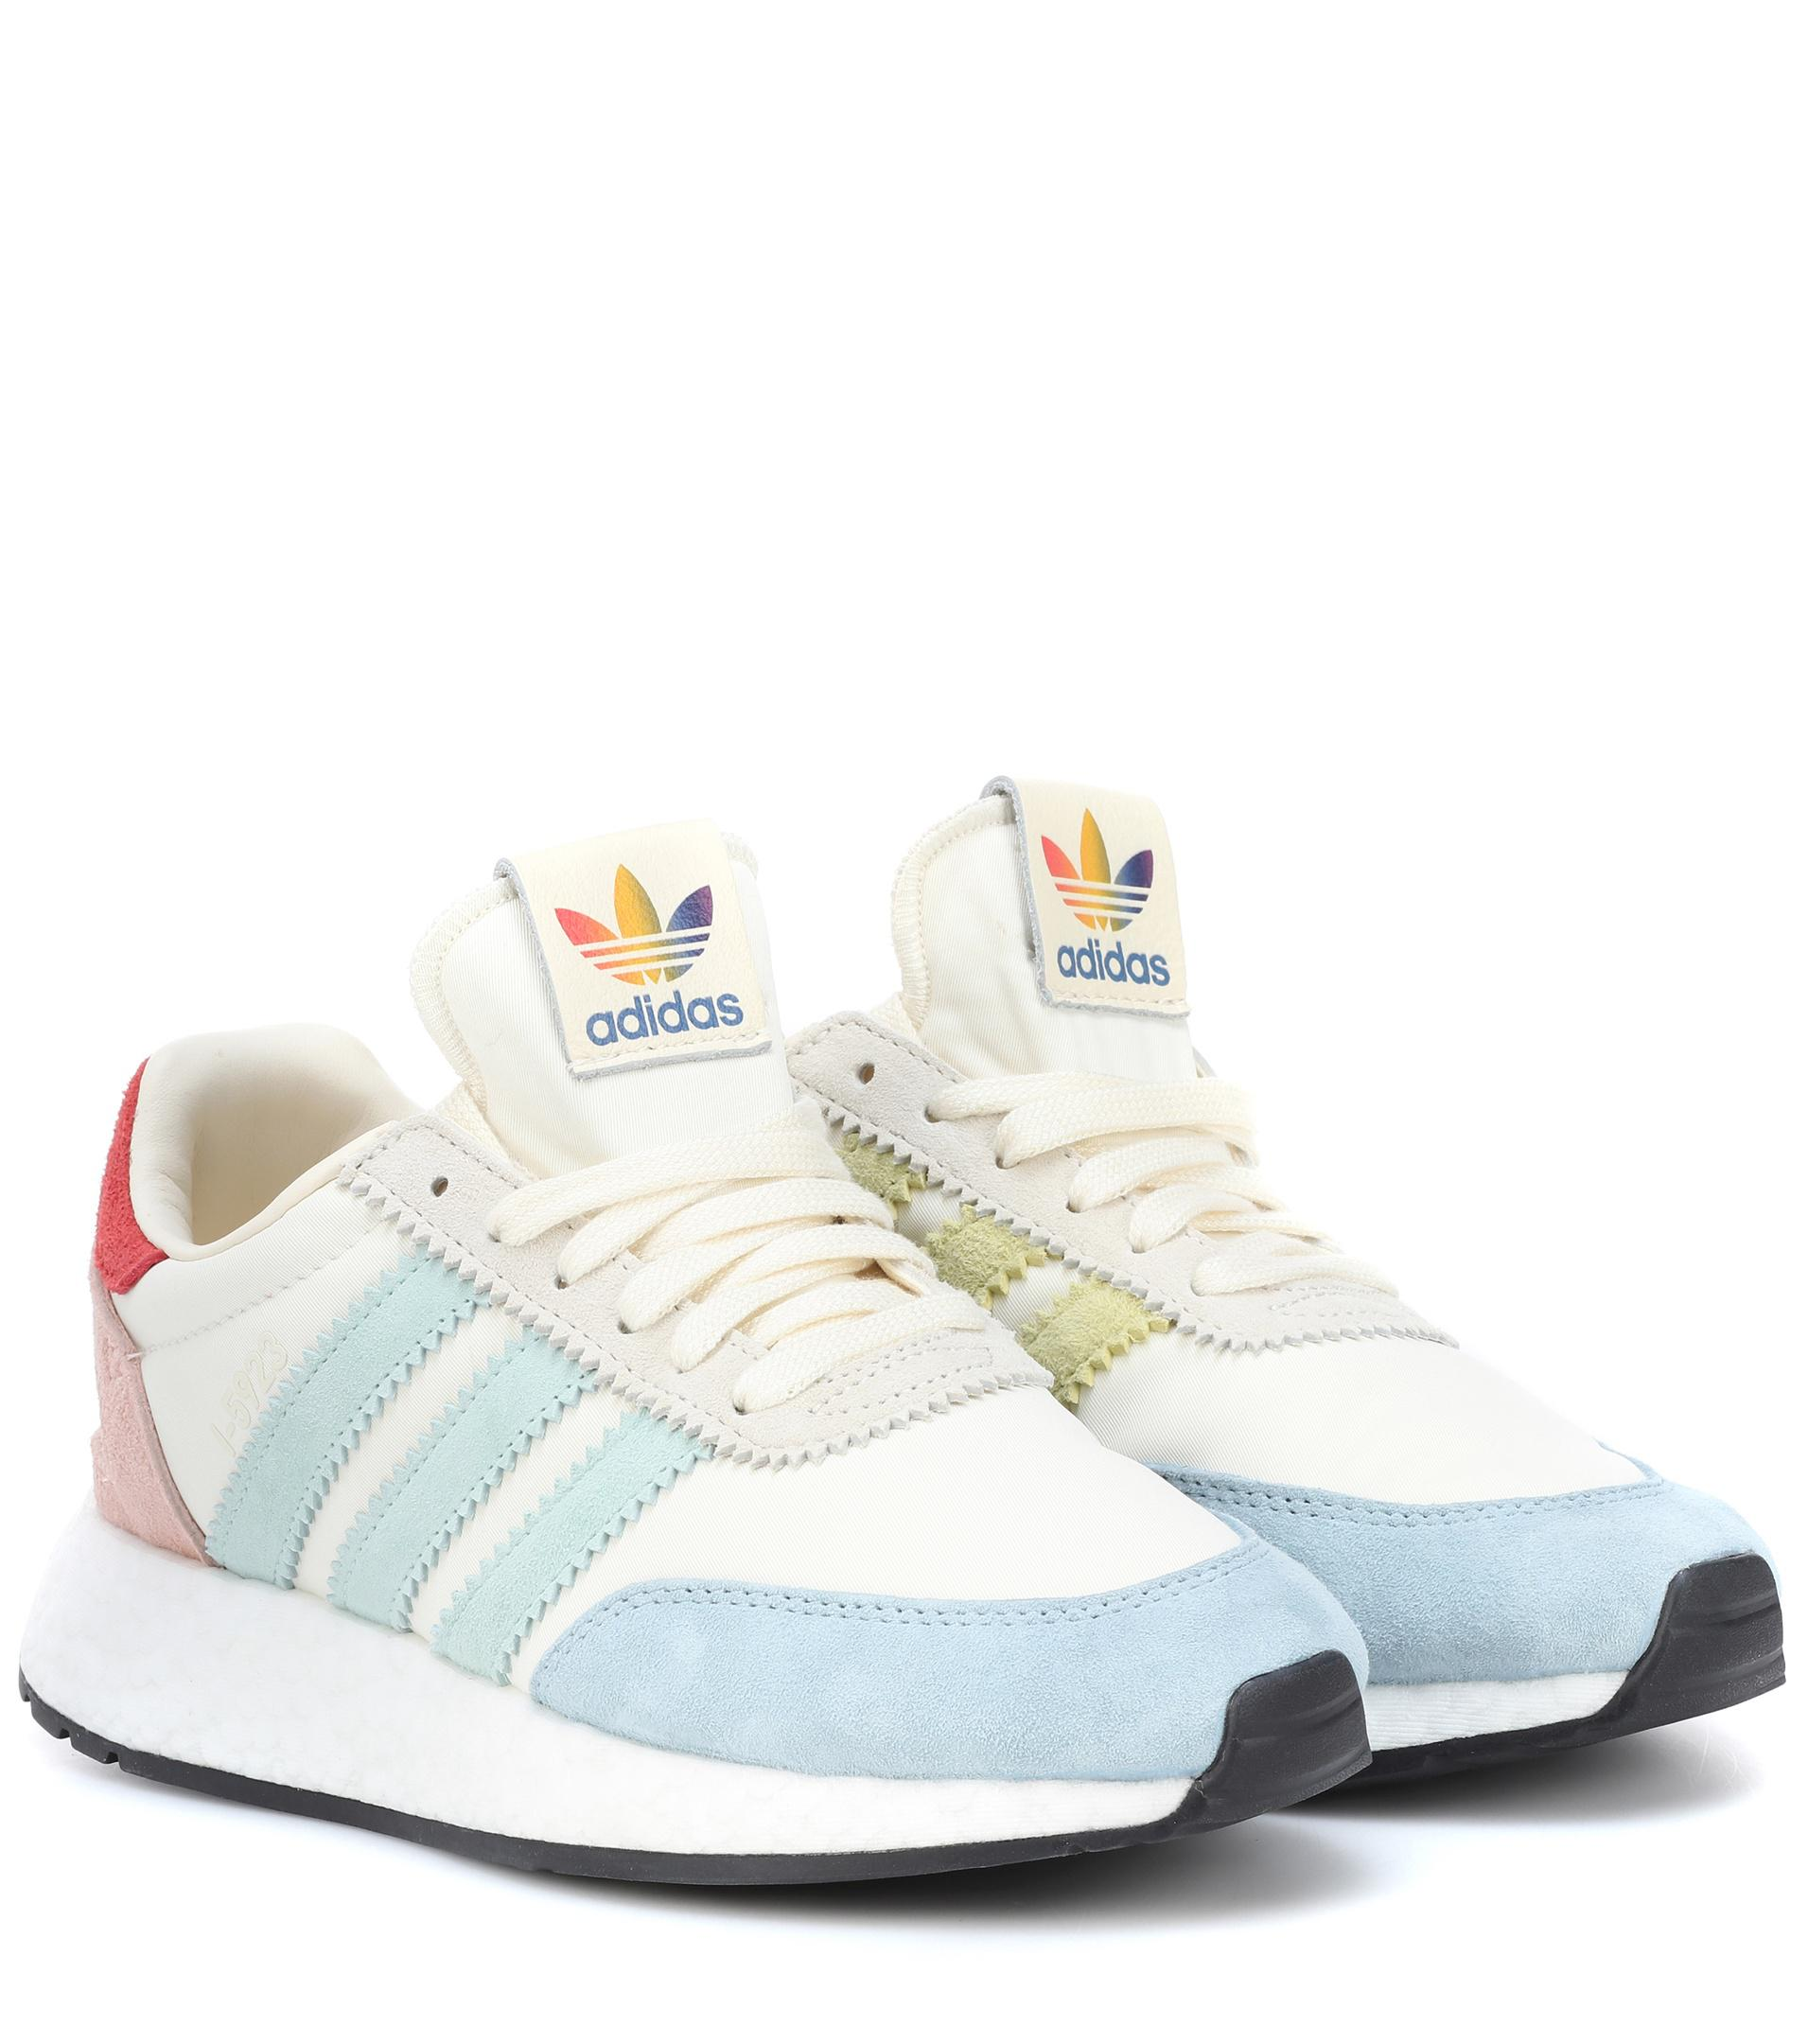 Lyst adidas originali - 5923 runner orgoglio scarpe bianche